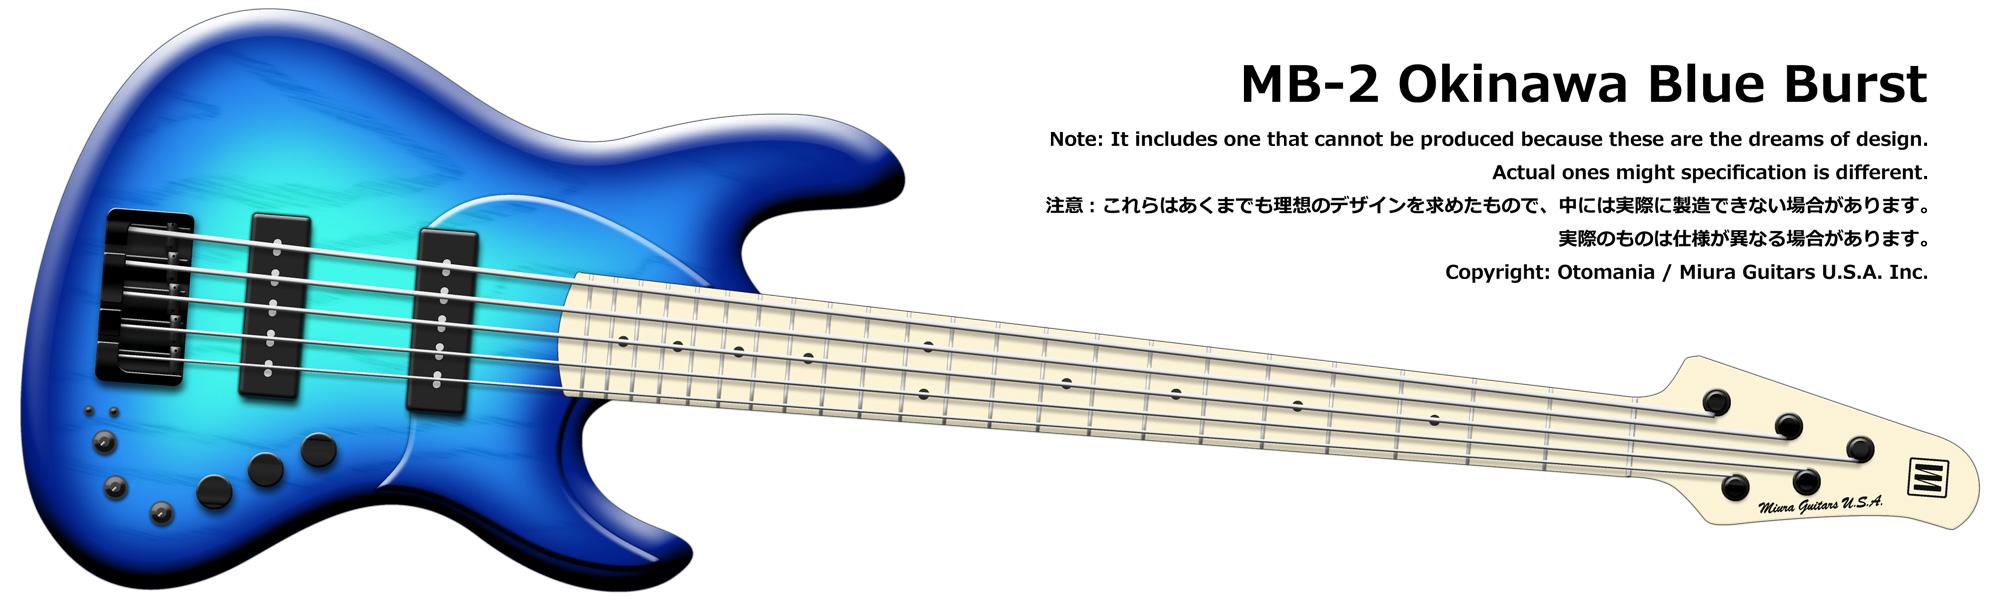 MB-2 Okinawa Blue Burst